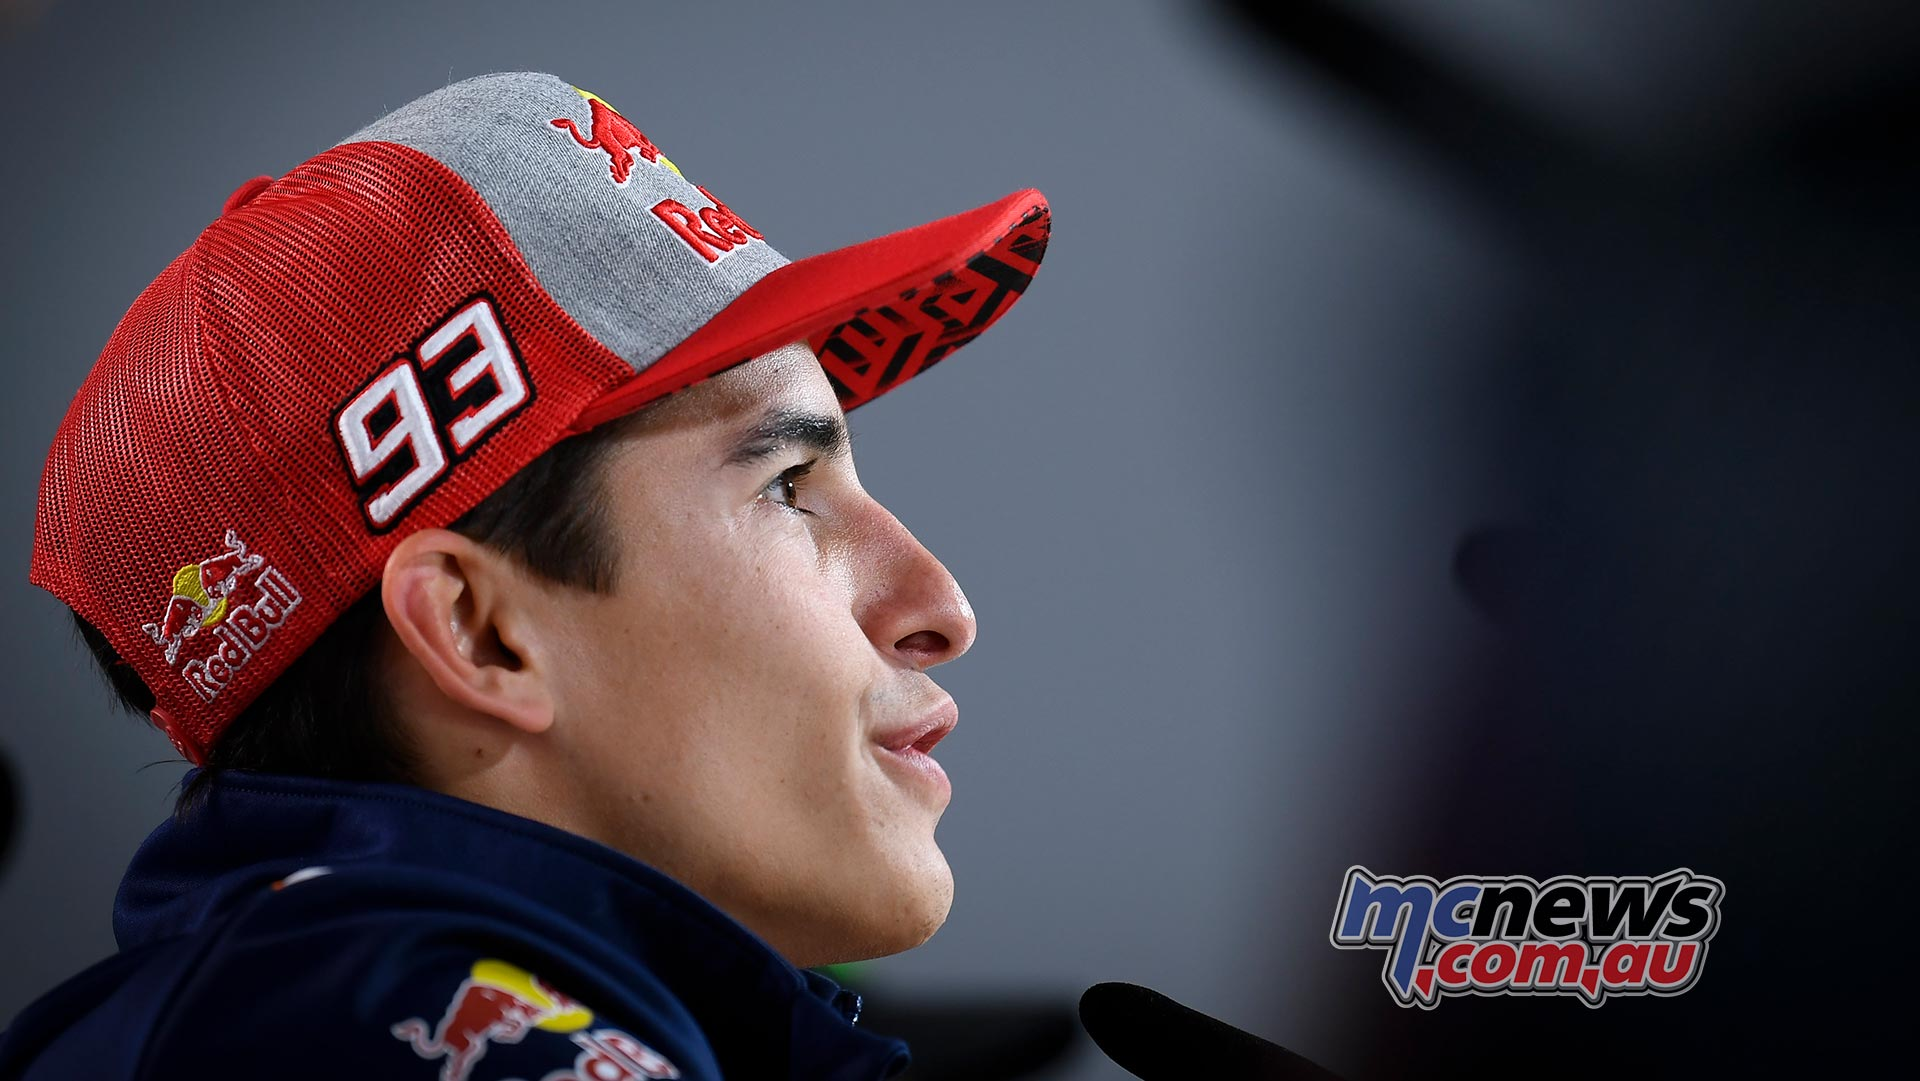 MotoGP Rnd Sachsenring Thu Marquez